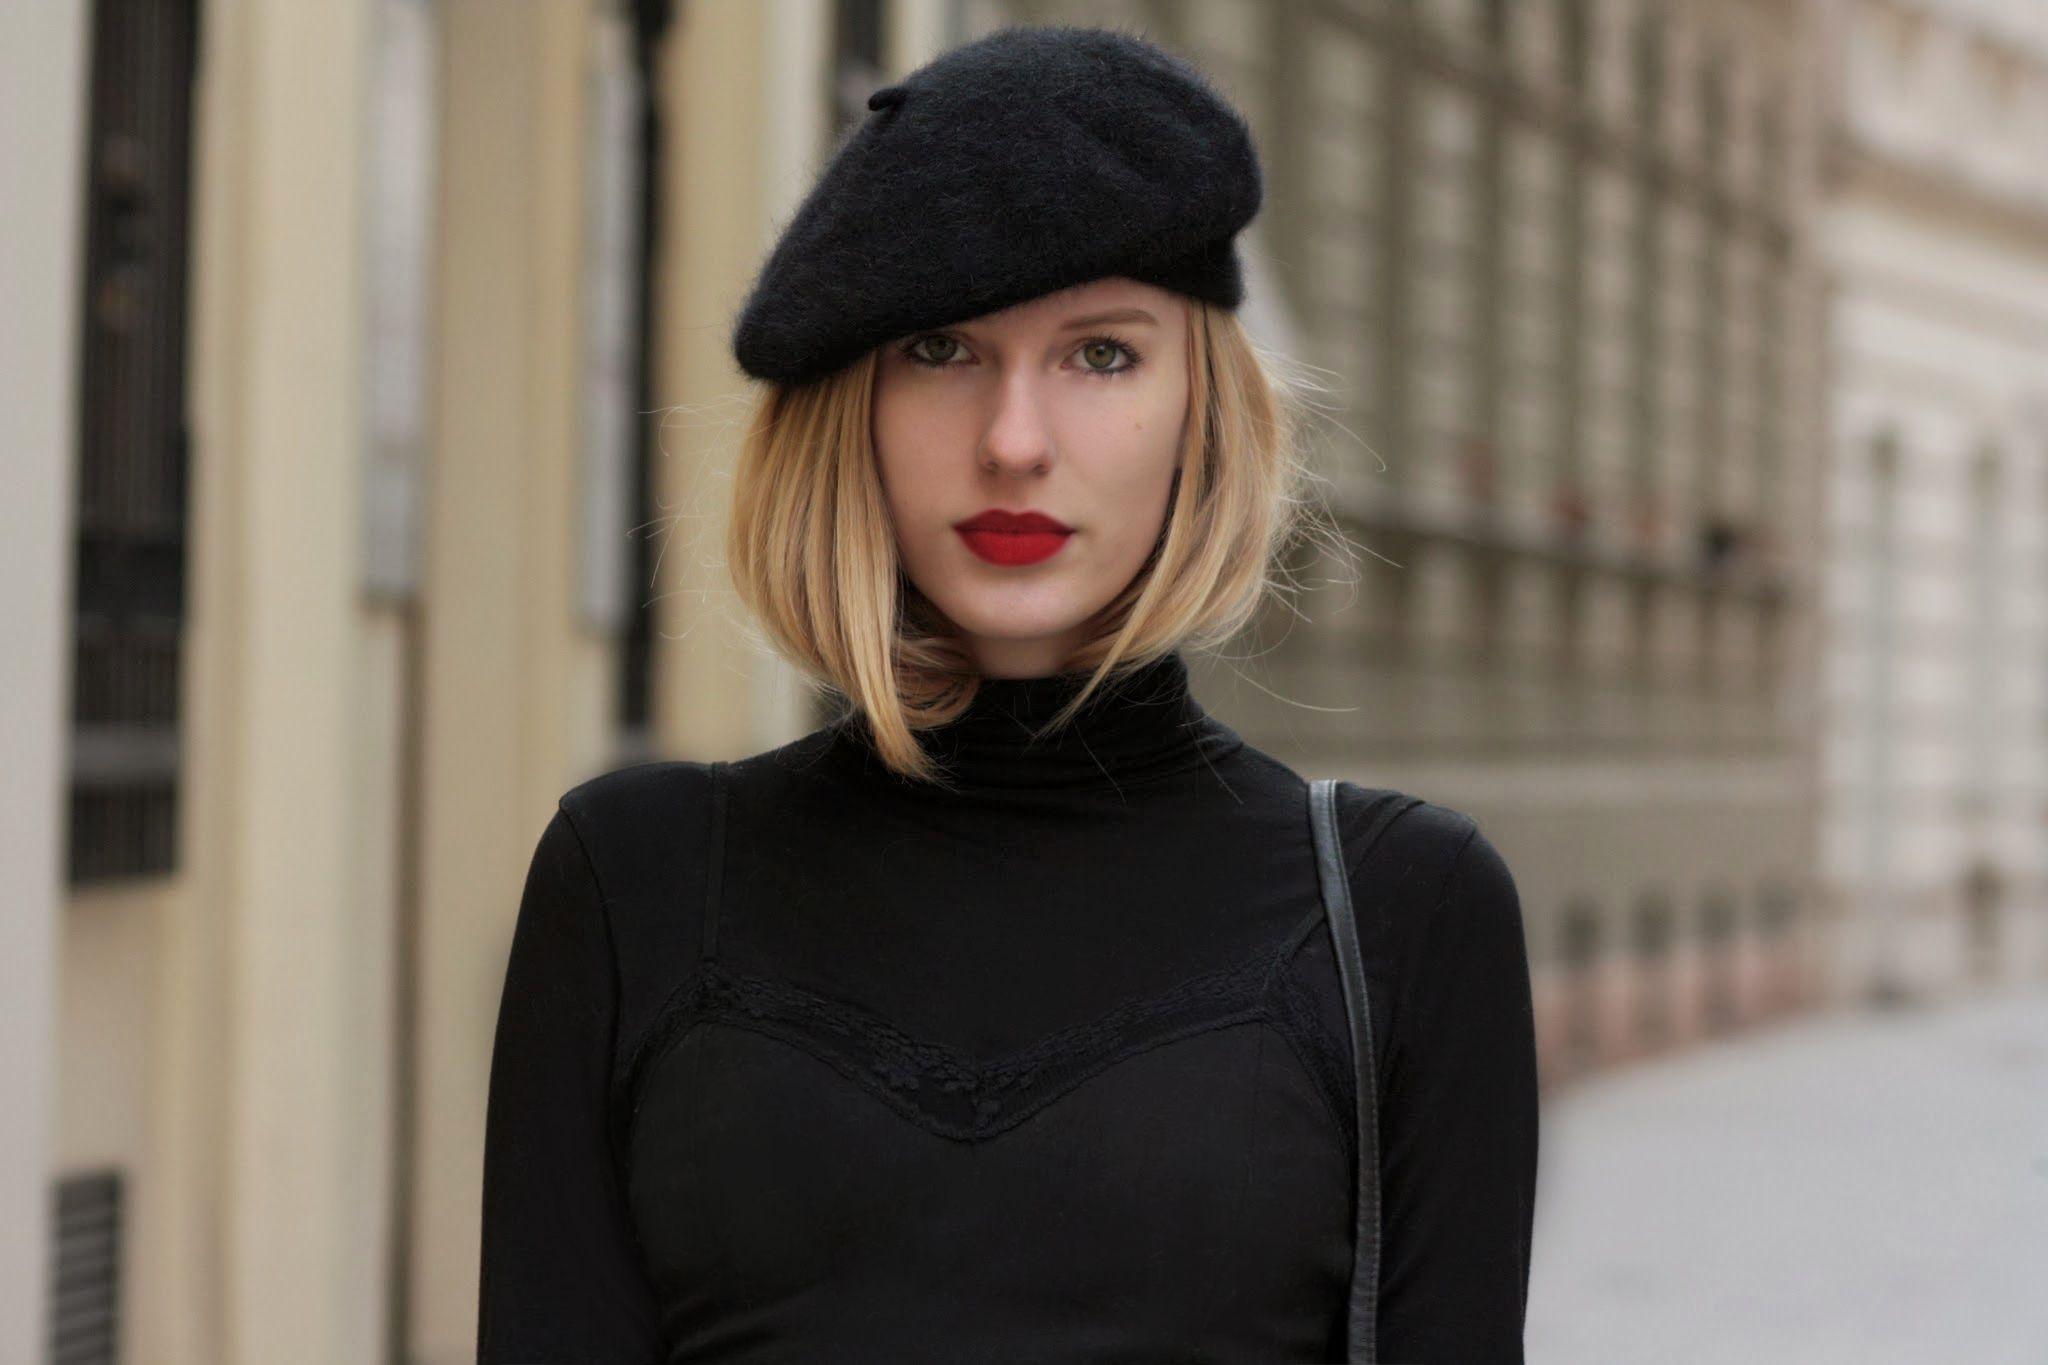 fbaa6e4ce87b0 beret   bright lips